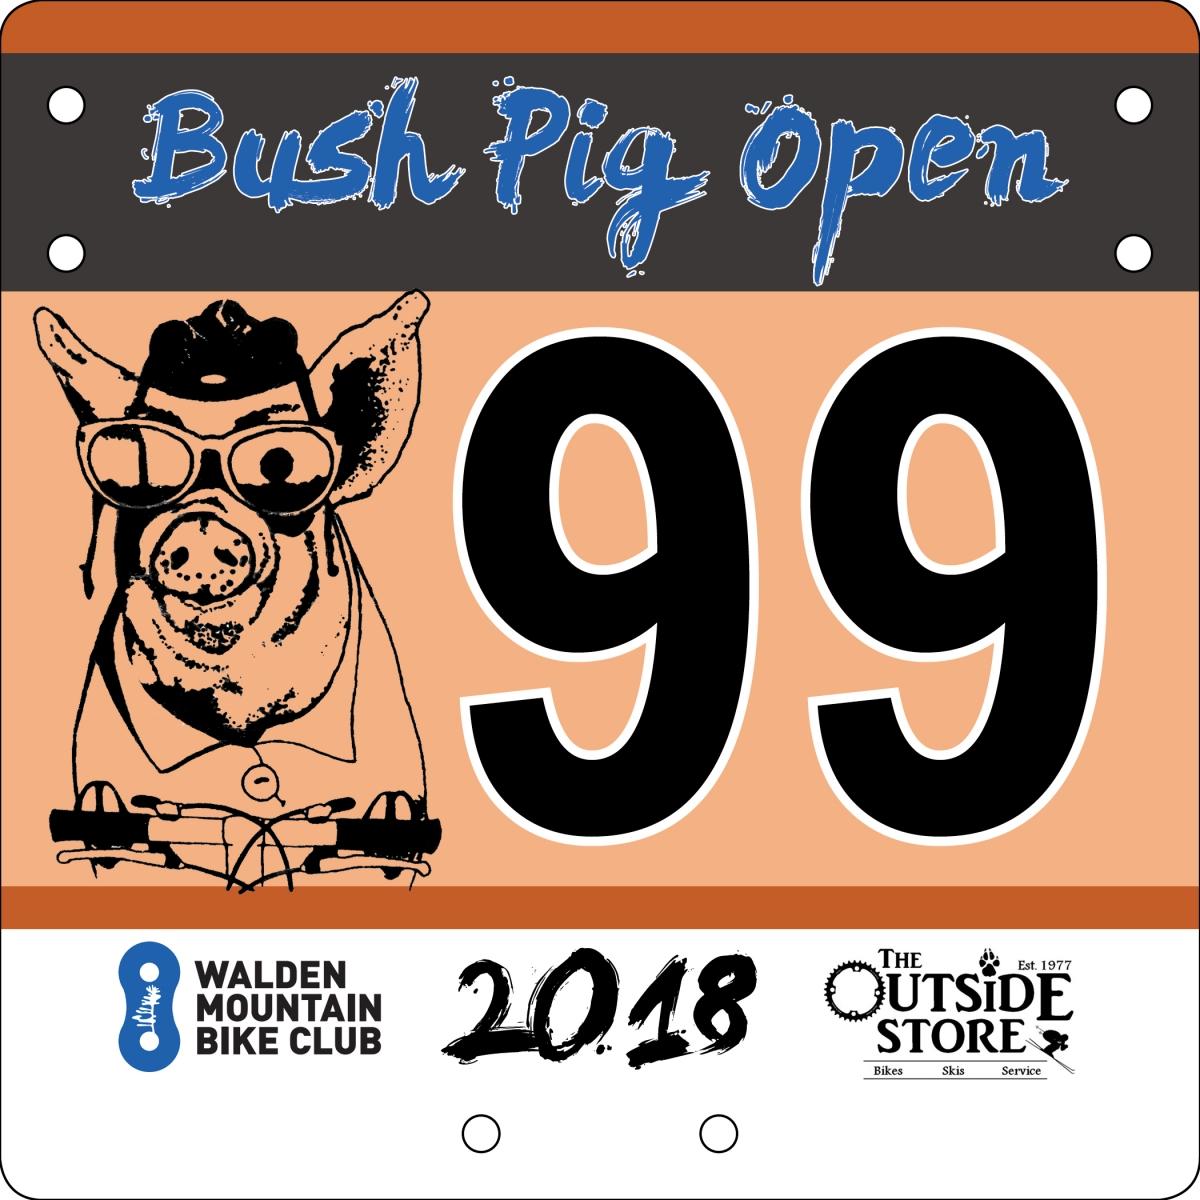 Bush Pig Open Evening Race - July